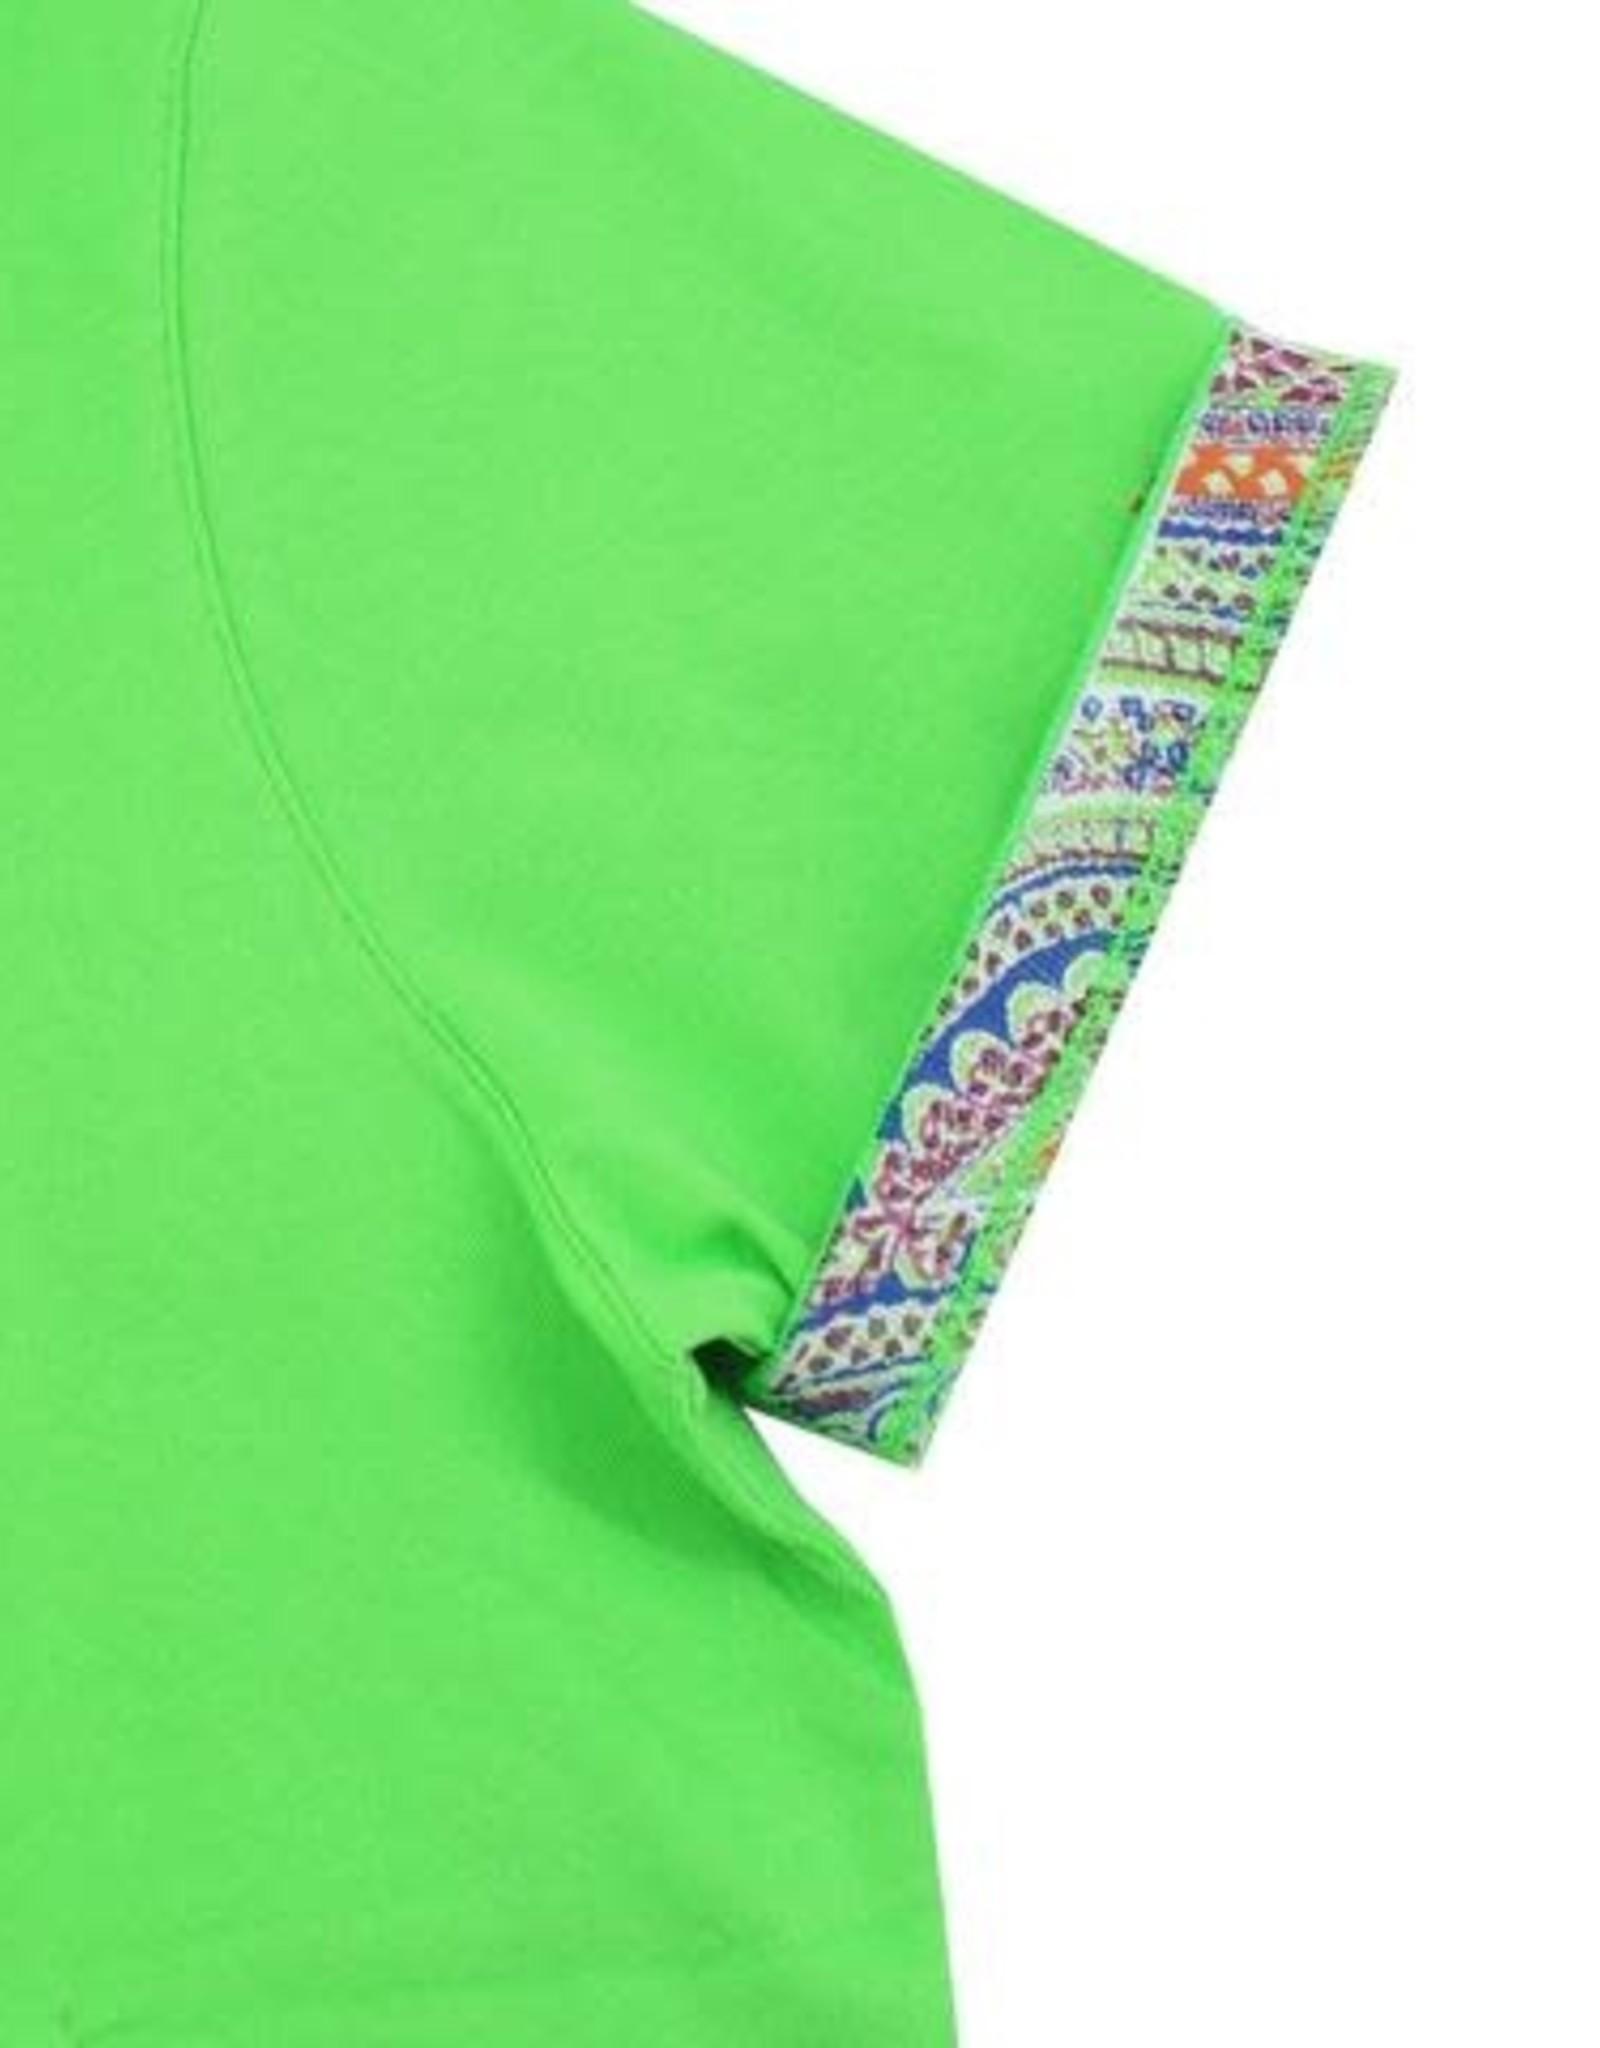 Eight X Green Polo Shirt with Paisley Print Collar